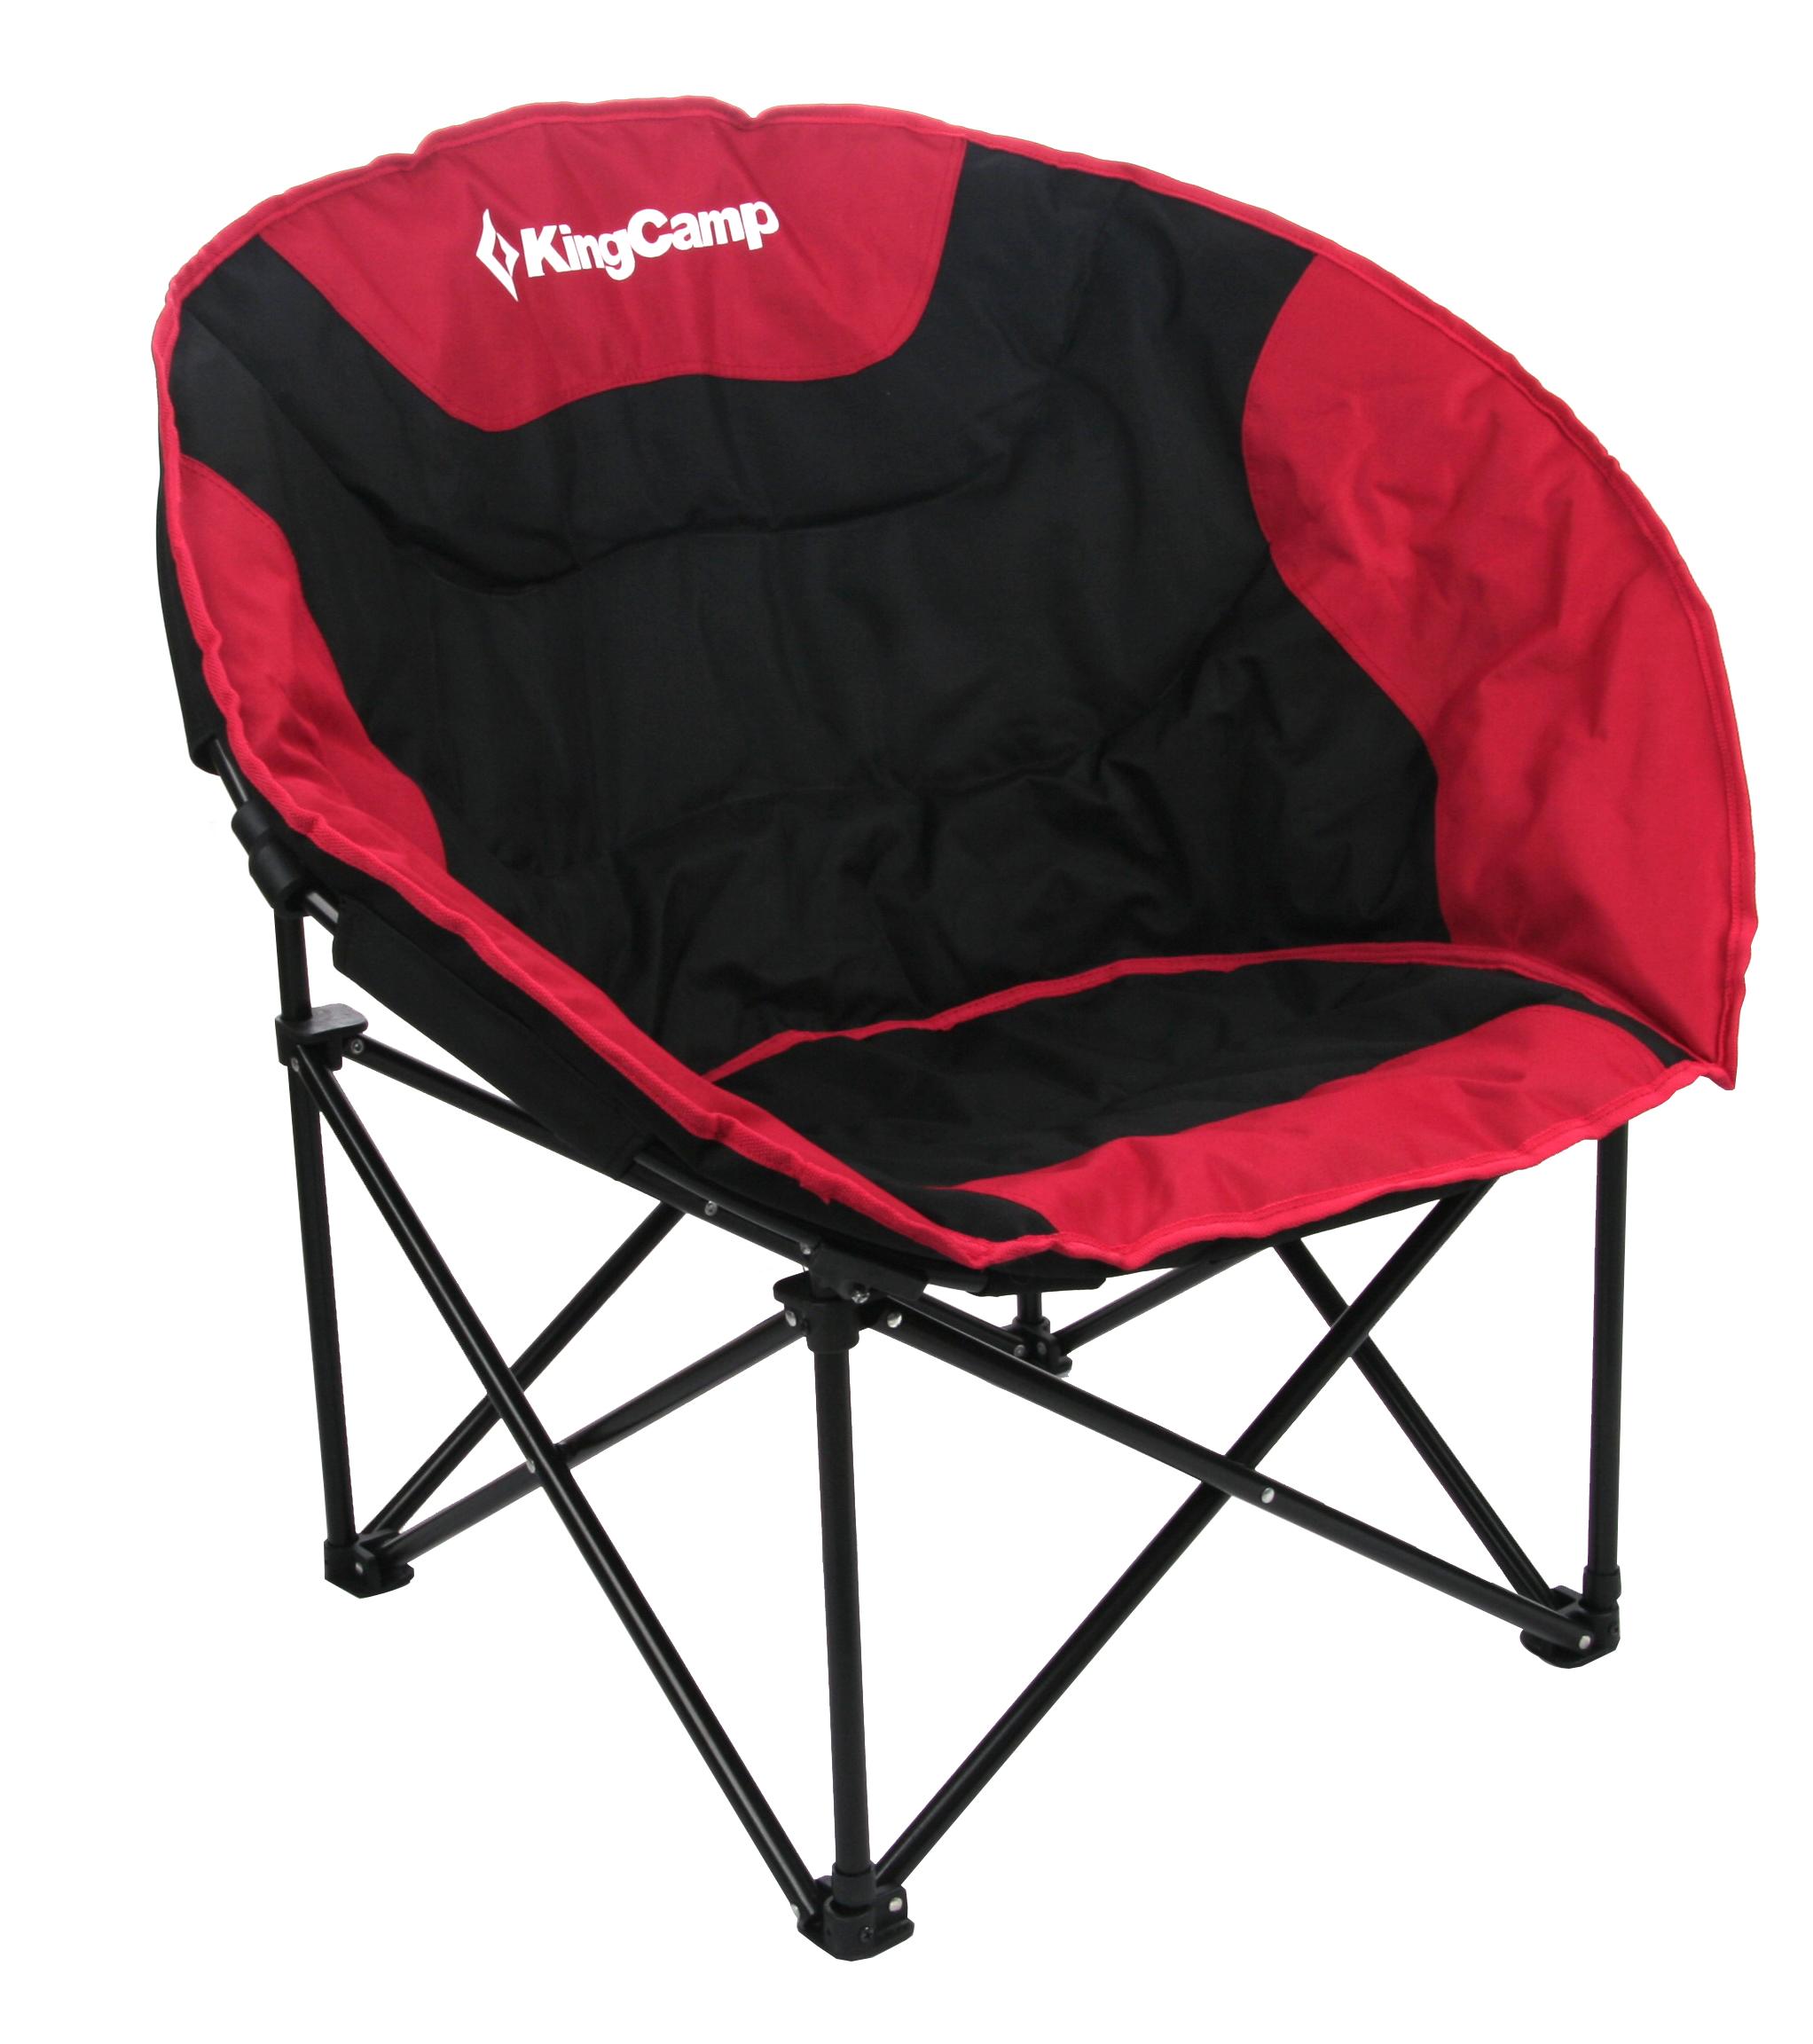 ������ King camp 3816 moon leisure chair